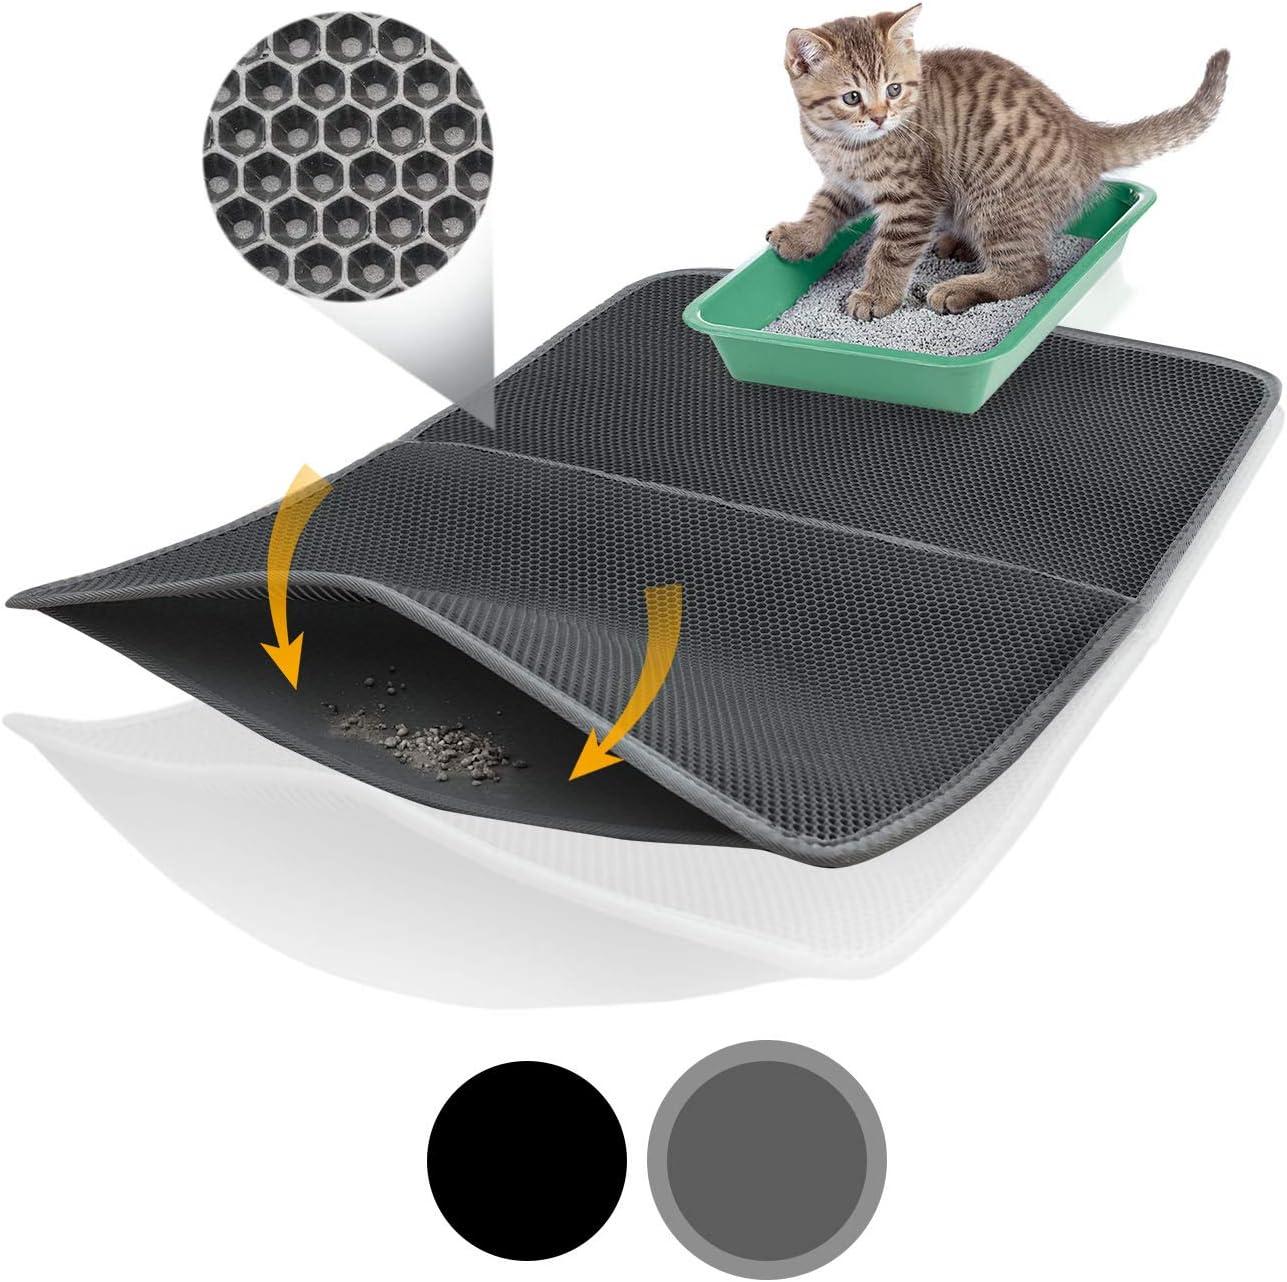 Bella & Balu XXL Alfombrilla Gato con diseño Panal - Alfombra Lavable con Fondo higiénico para Gatos - para un apartamento Limpio sin Arena sanitara para Gatos (Azul | 100 x 65